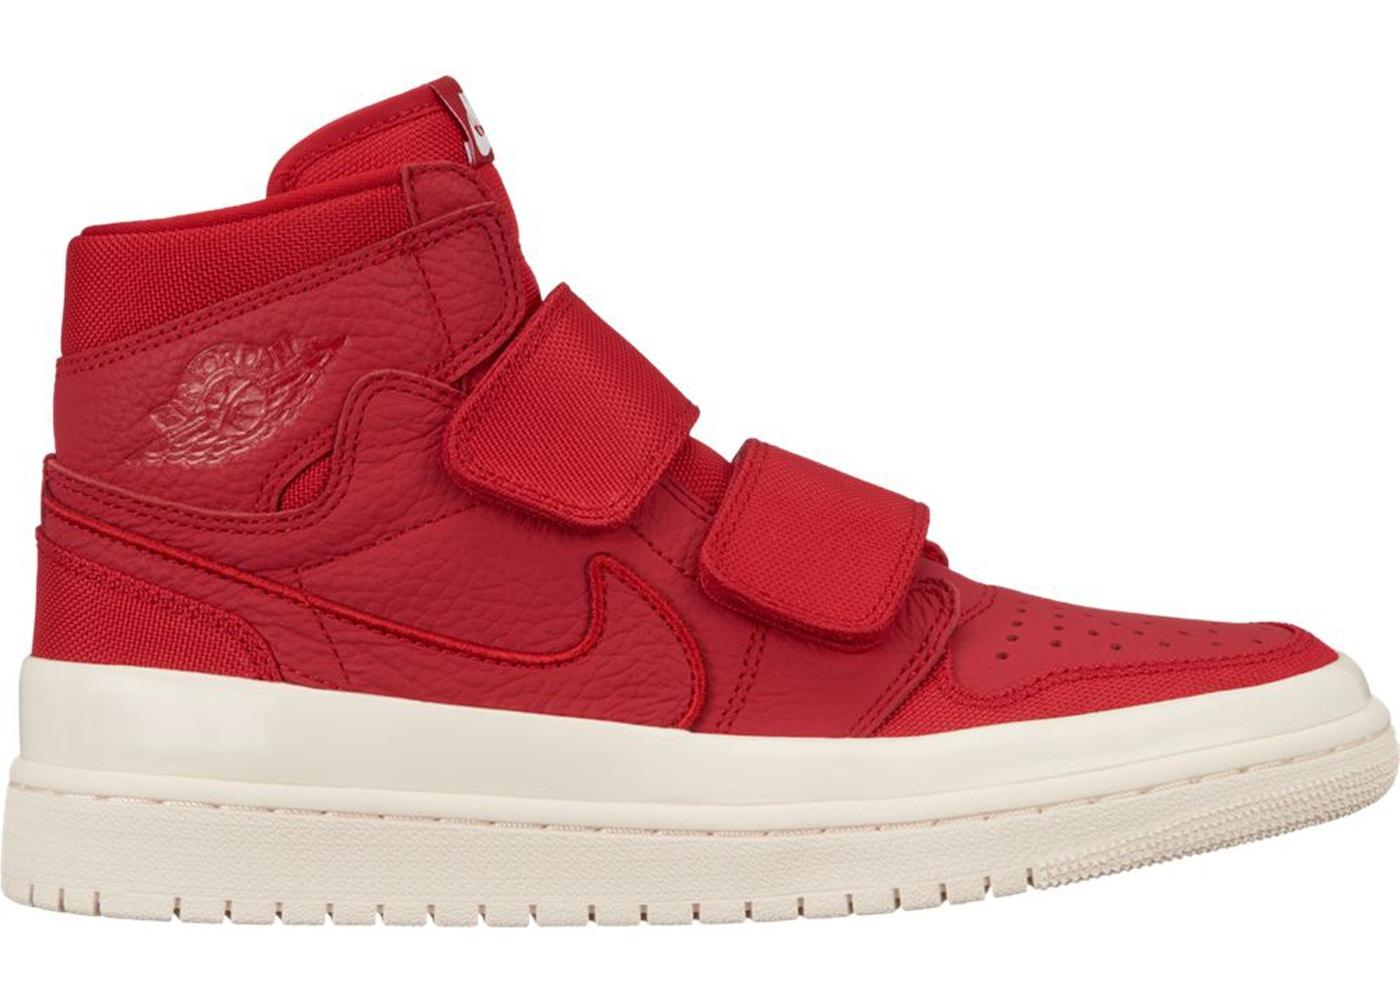 19a1c657256 Jordan 1 Retro High Double Strap Gym Red - AQ7924-601